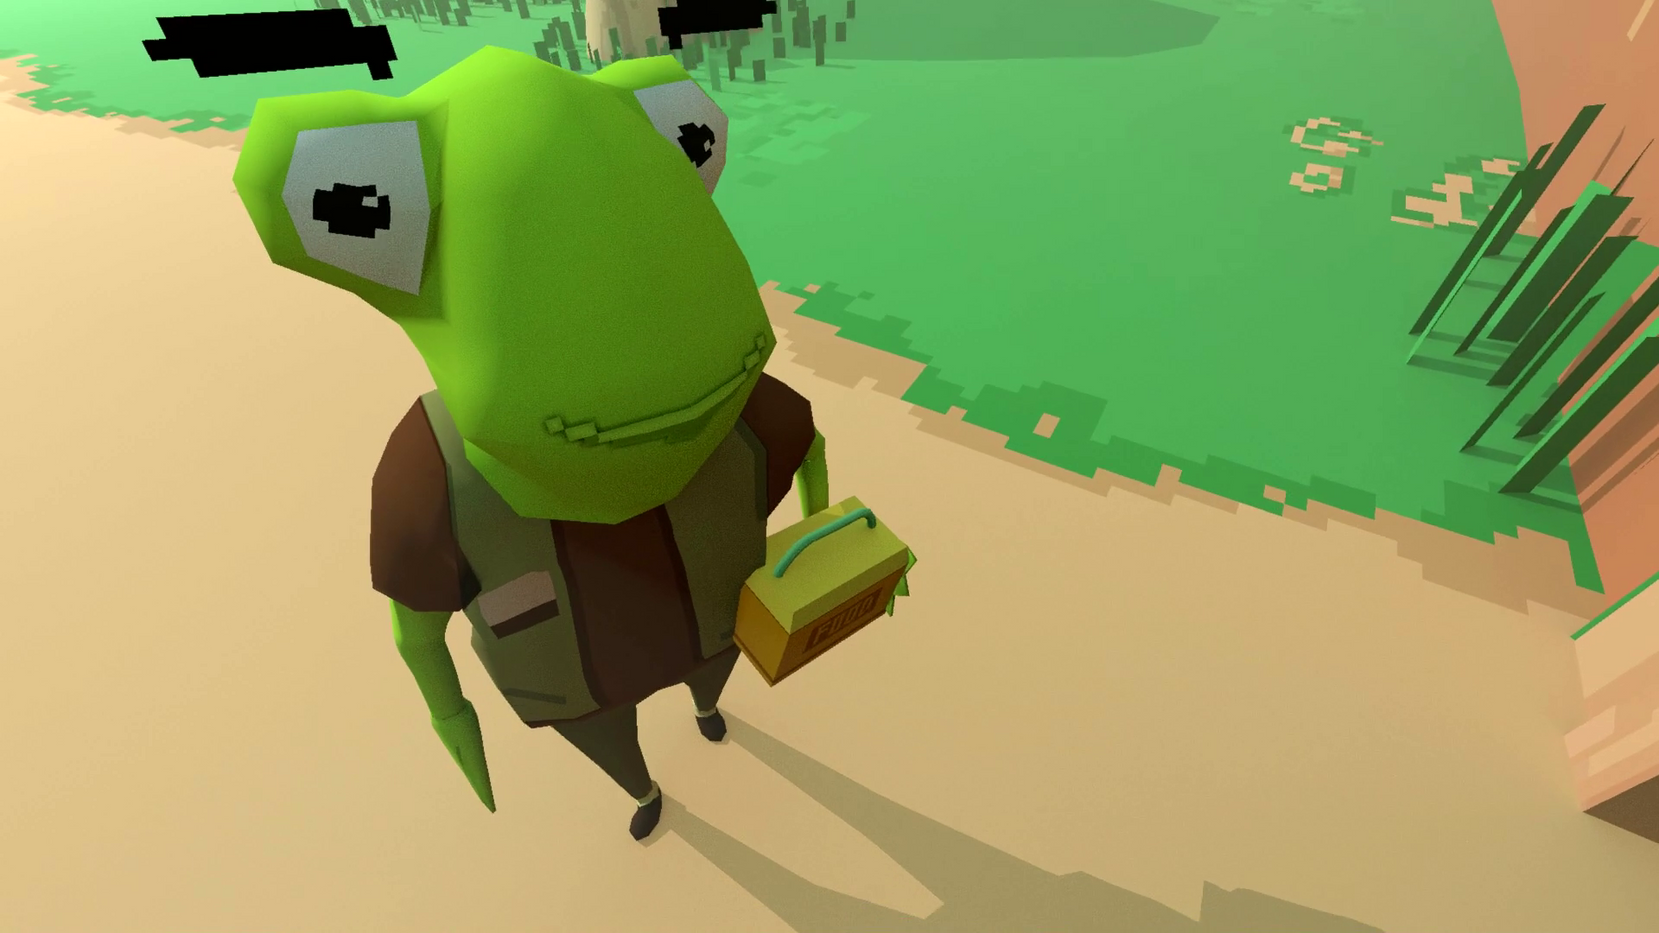 The_Secret_of_Frogland_xxLlJD0Aj9.png